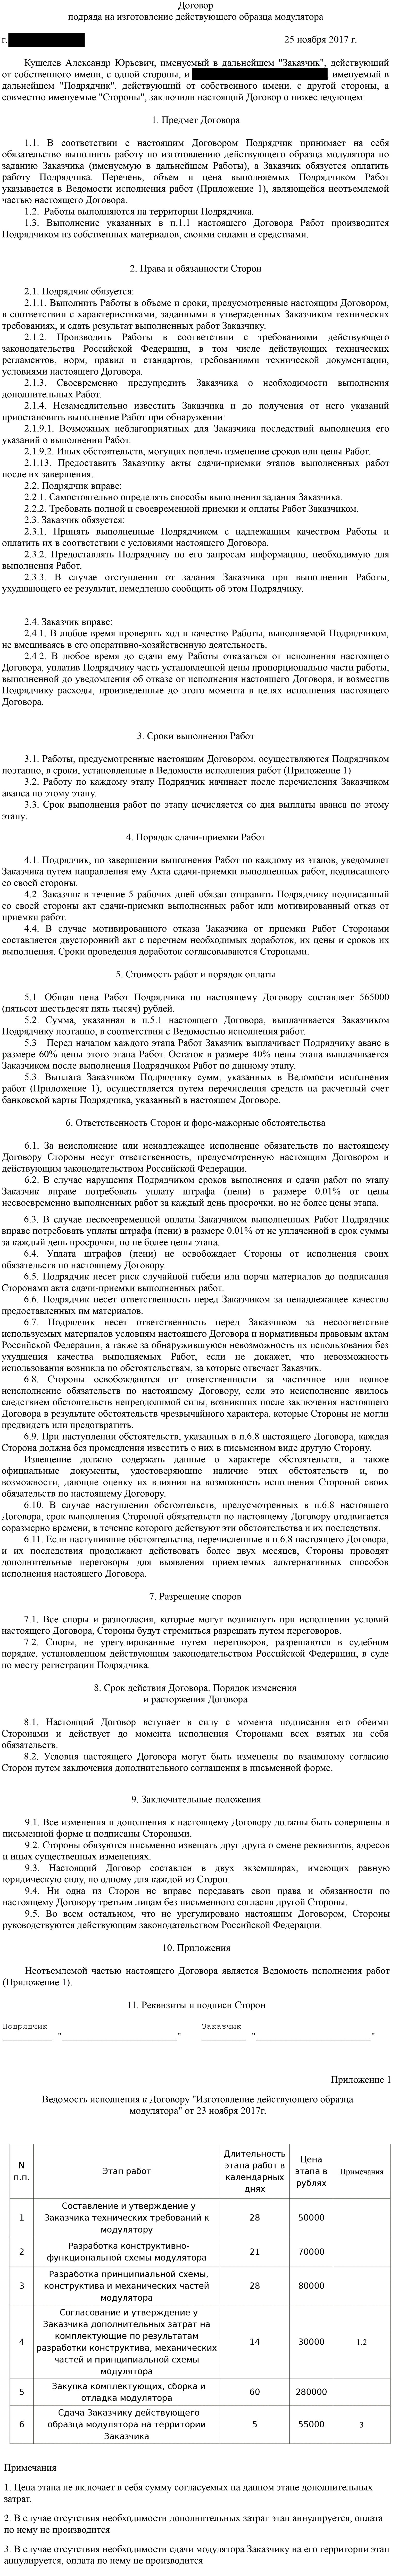 https://img-fotki.yandex.ru/get/877700/158289418.4b6/0_189d0a_6f2b8d28_orig.png